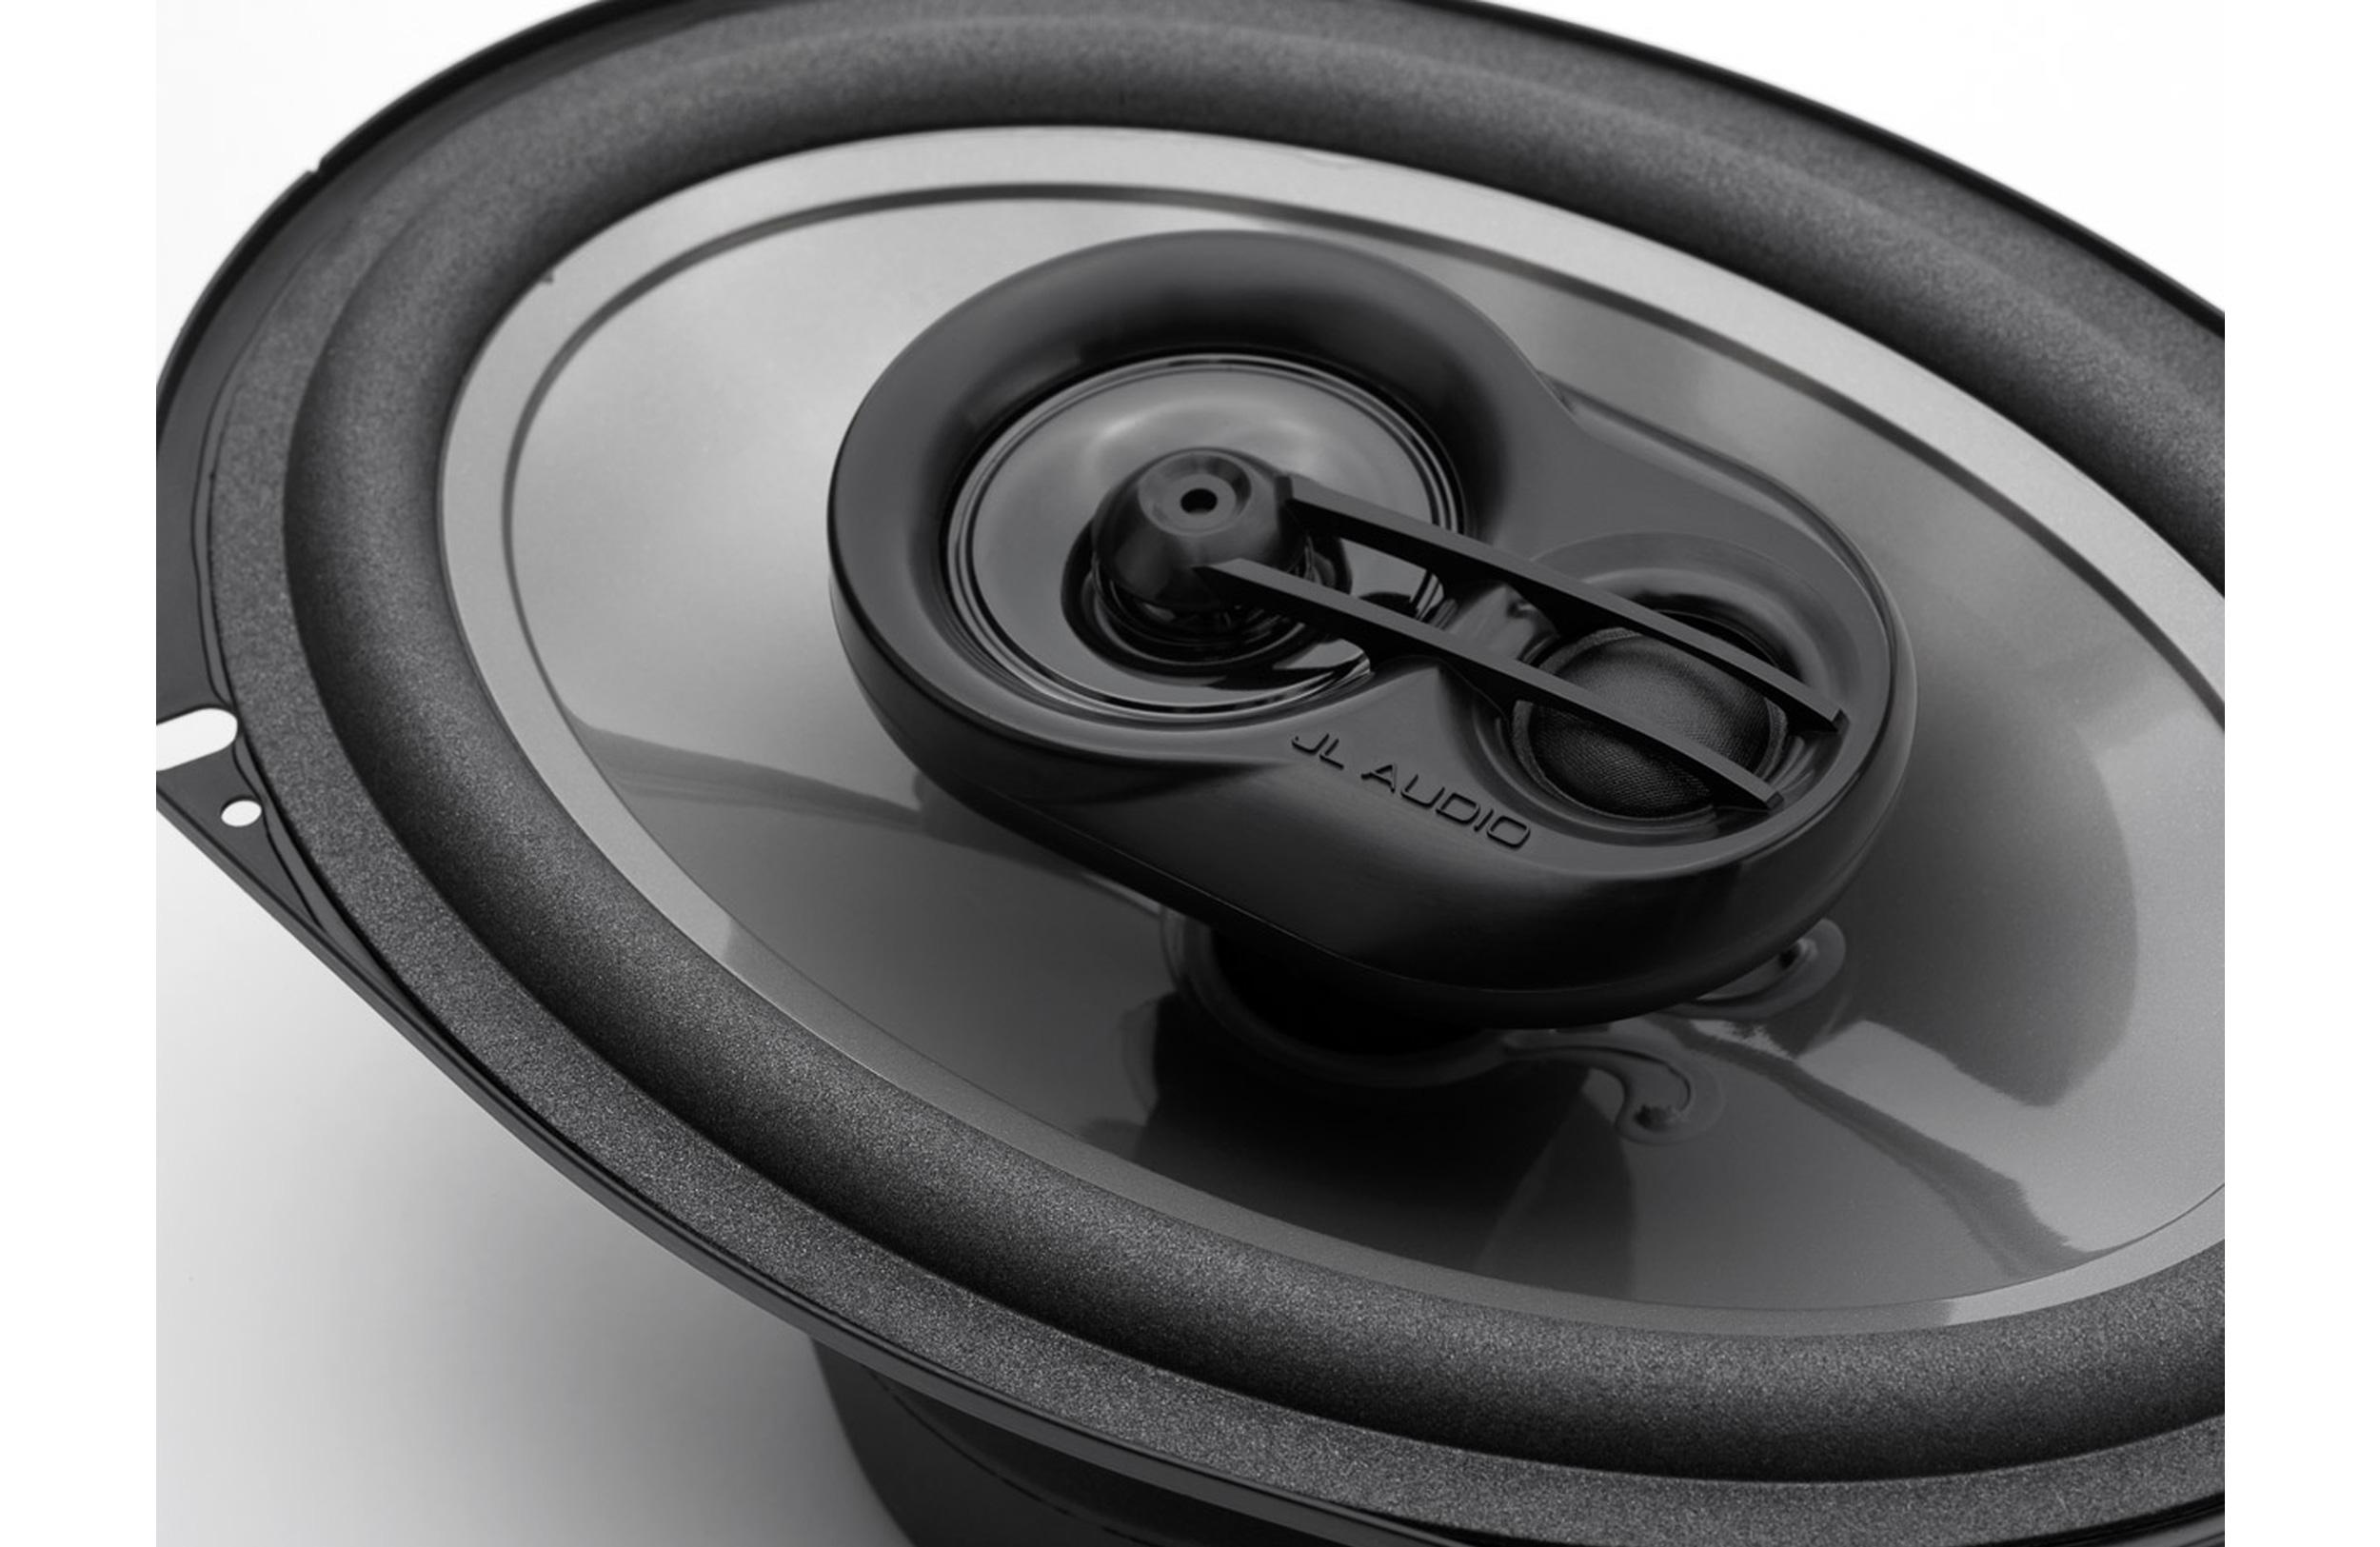 JL Audio C2-690tx C2 Series 6x9 inch 3-way car speakers 225W Peak Power